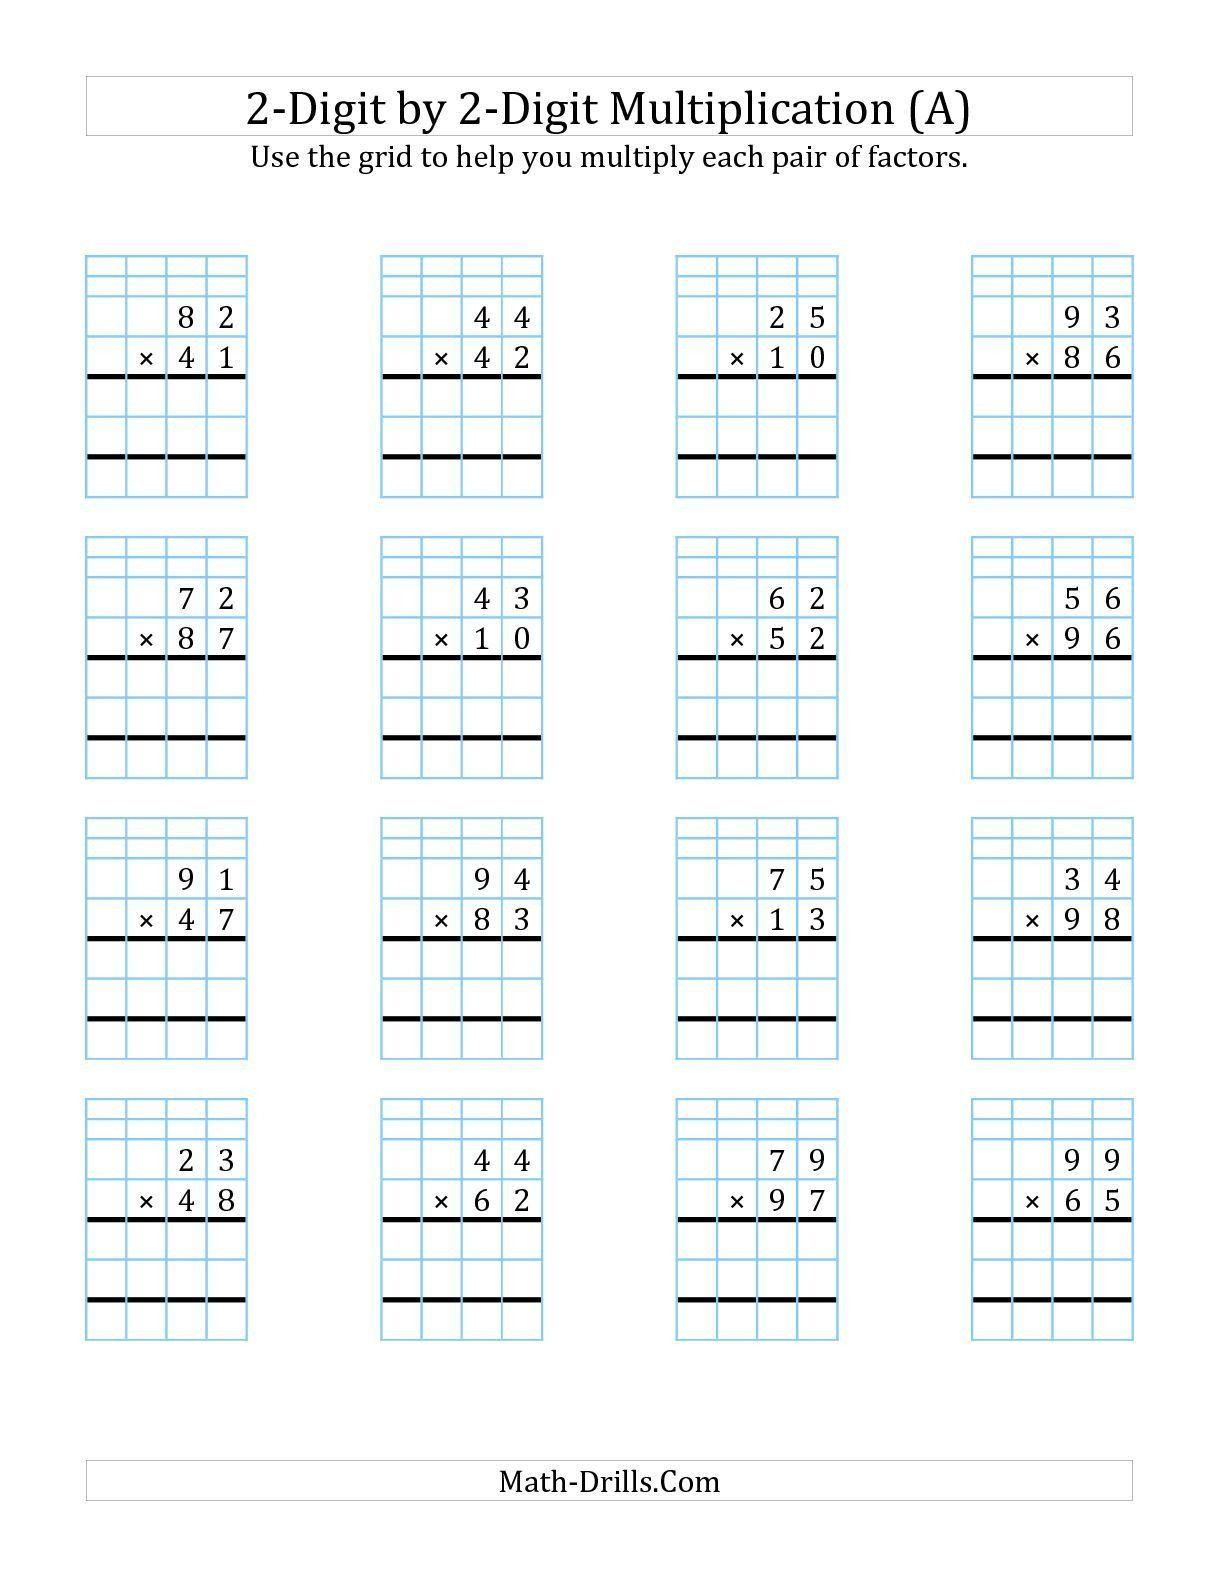 Box Method Multiplication Worksheet Partial Products Worksheets Free Product Multiplication Printable Wo In 2020 Multiplication Worksheets Multiplication Math Drills